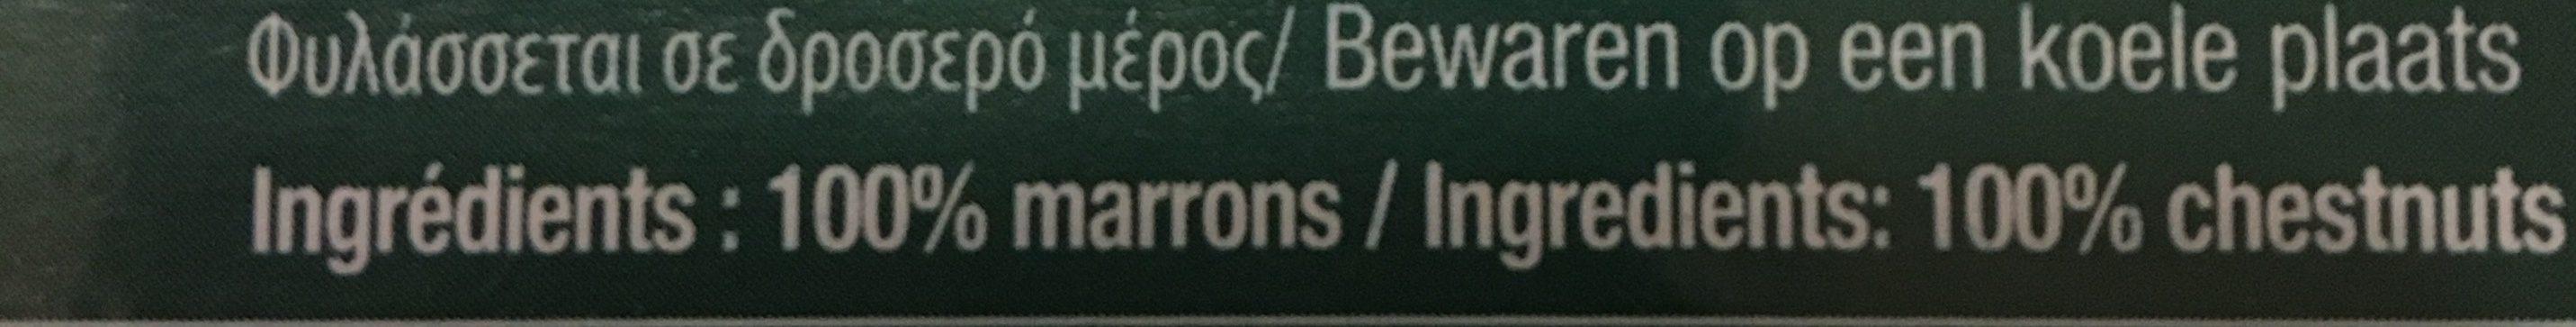 Marrons à La Vapeur - Ingrediënten - fr